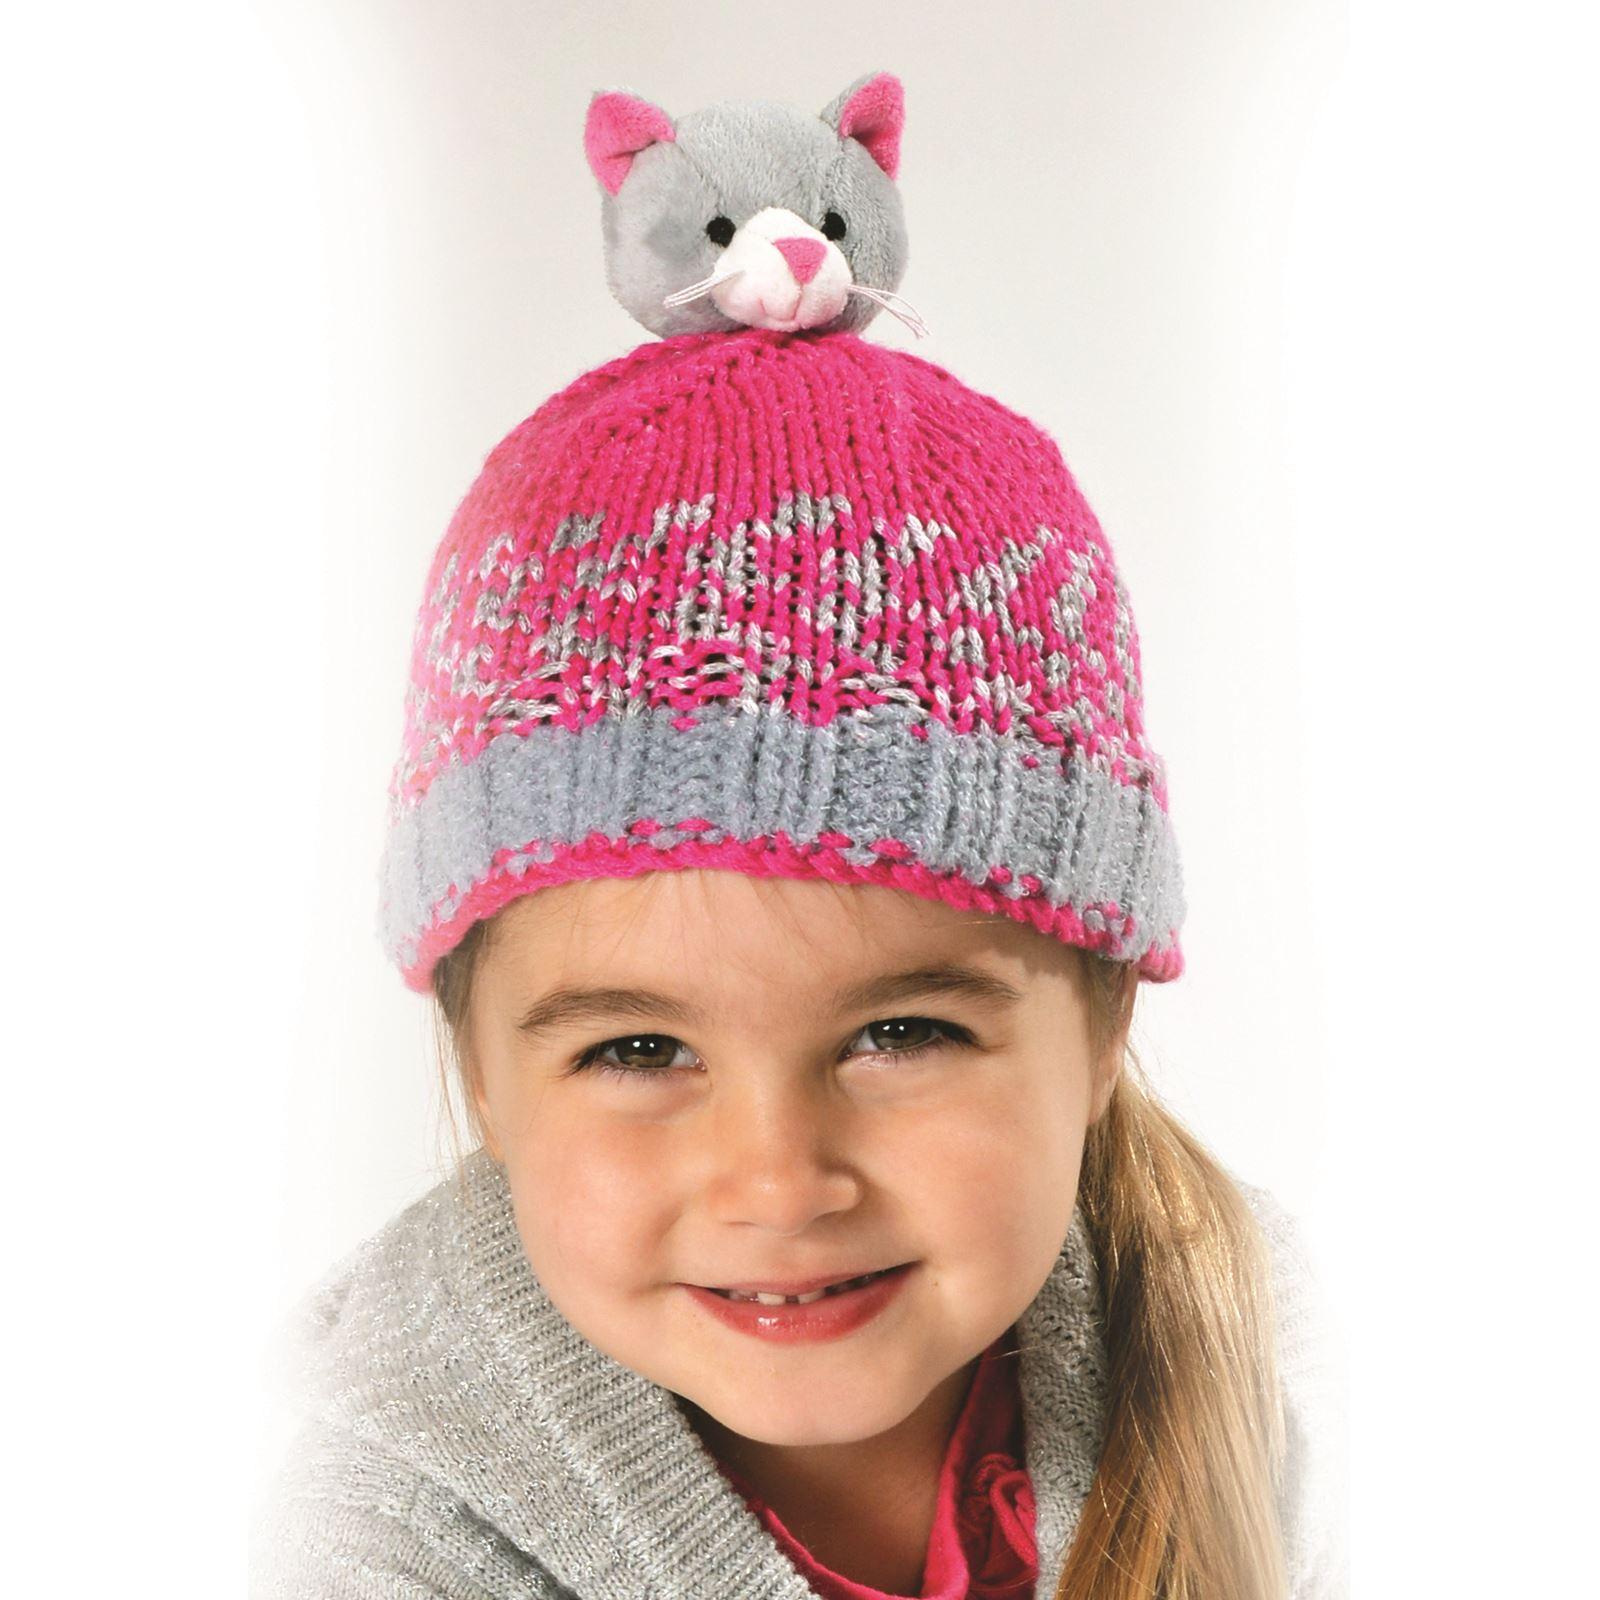 DMC Top This! Kids Hat Knitting Kits Characters Christmas Wool eBay